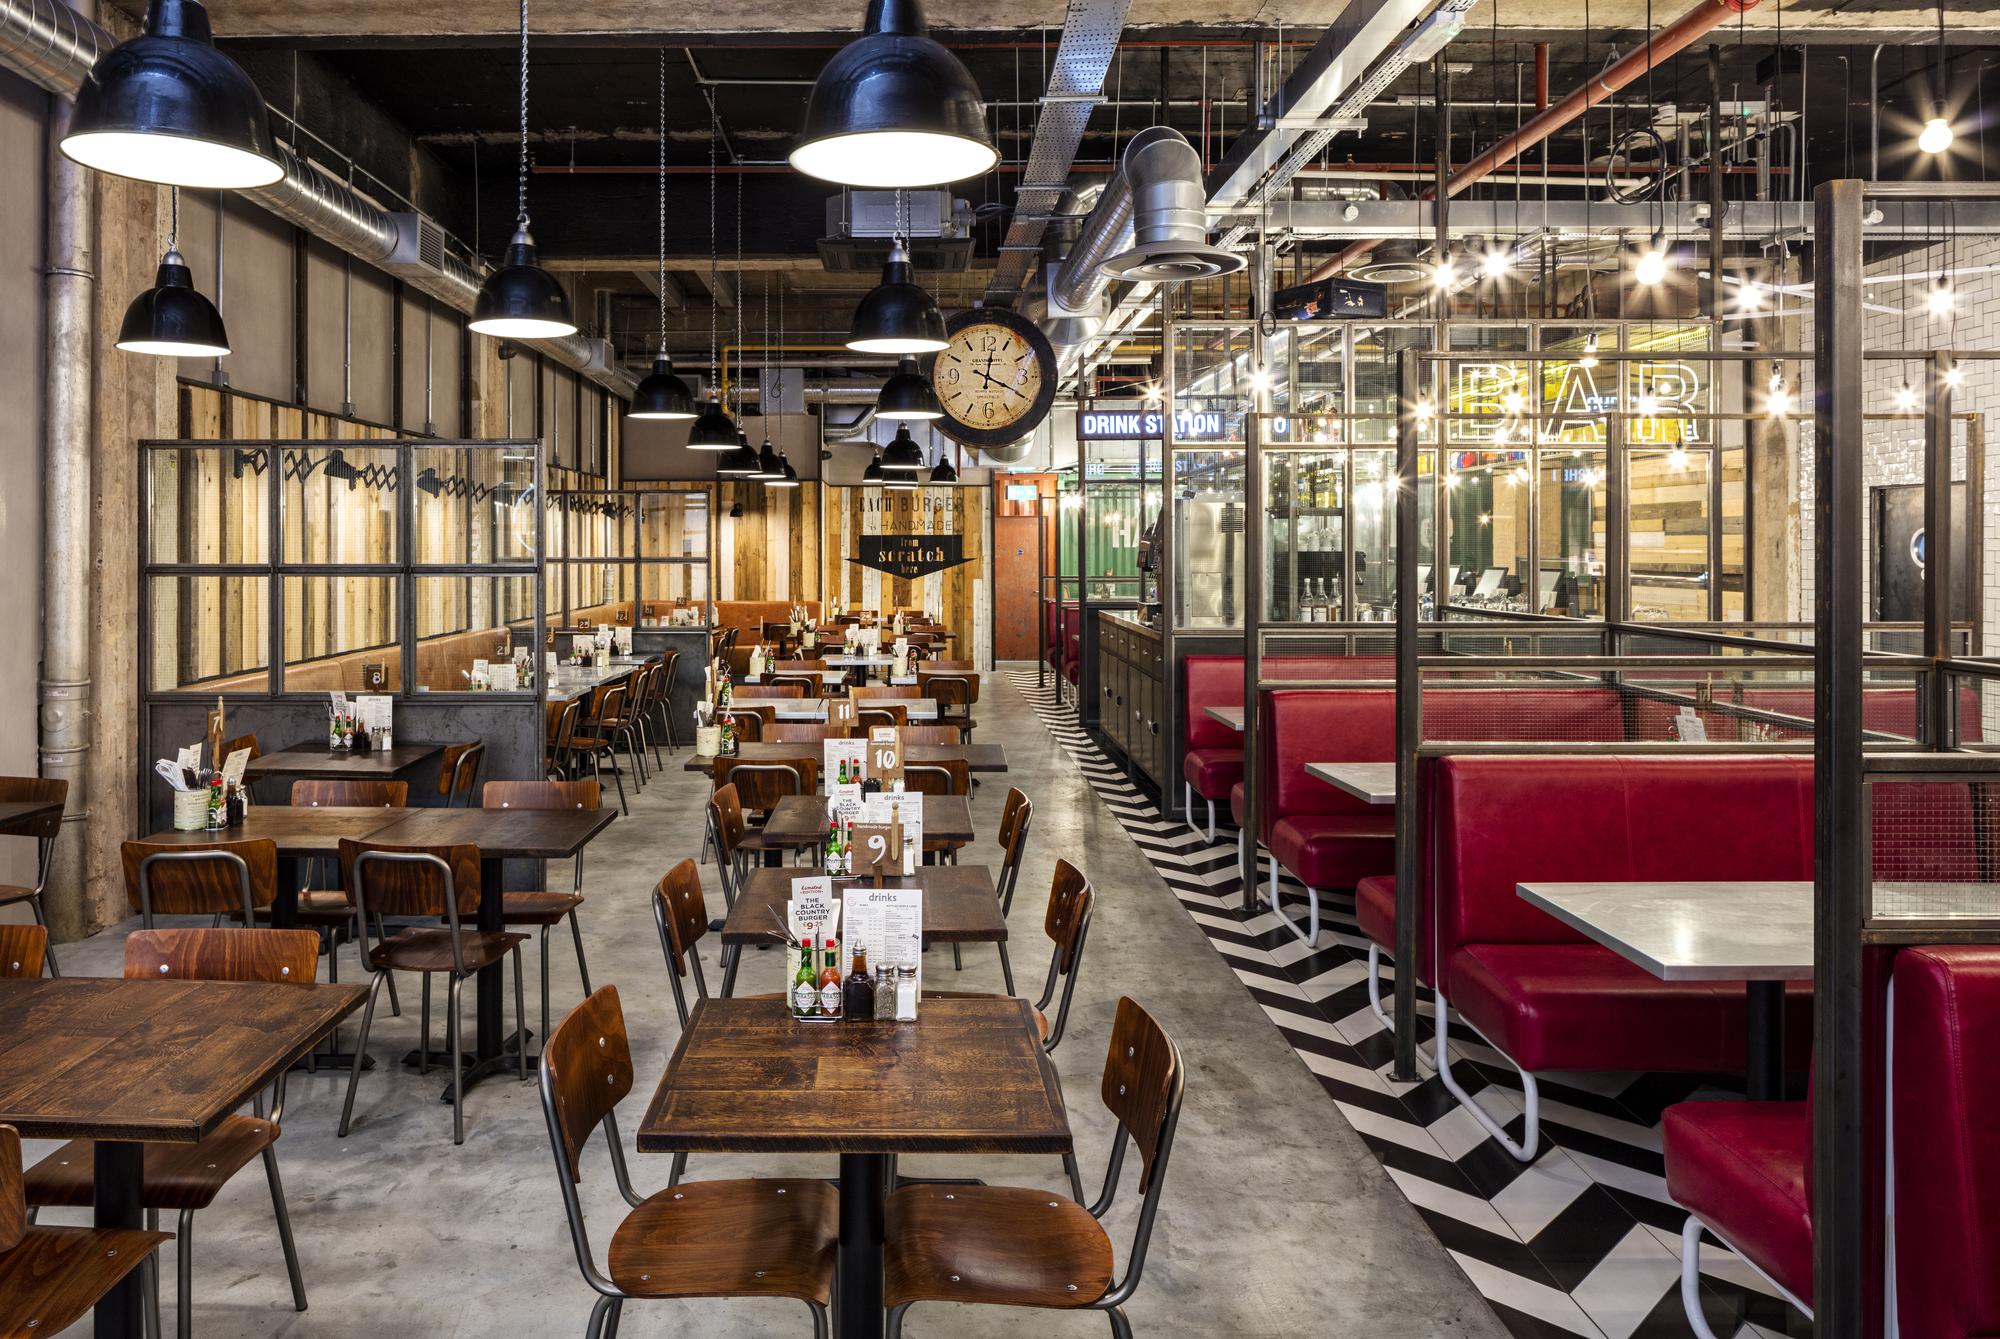 Gallery of 2016 Restaurant  Bar Design Awards Announced  23